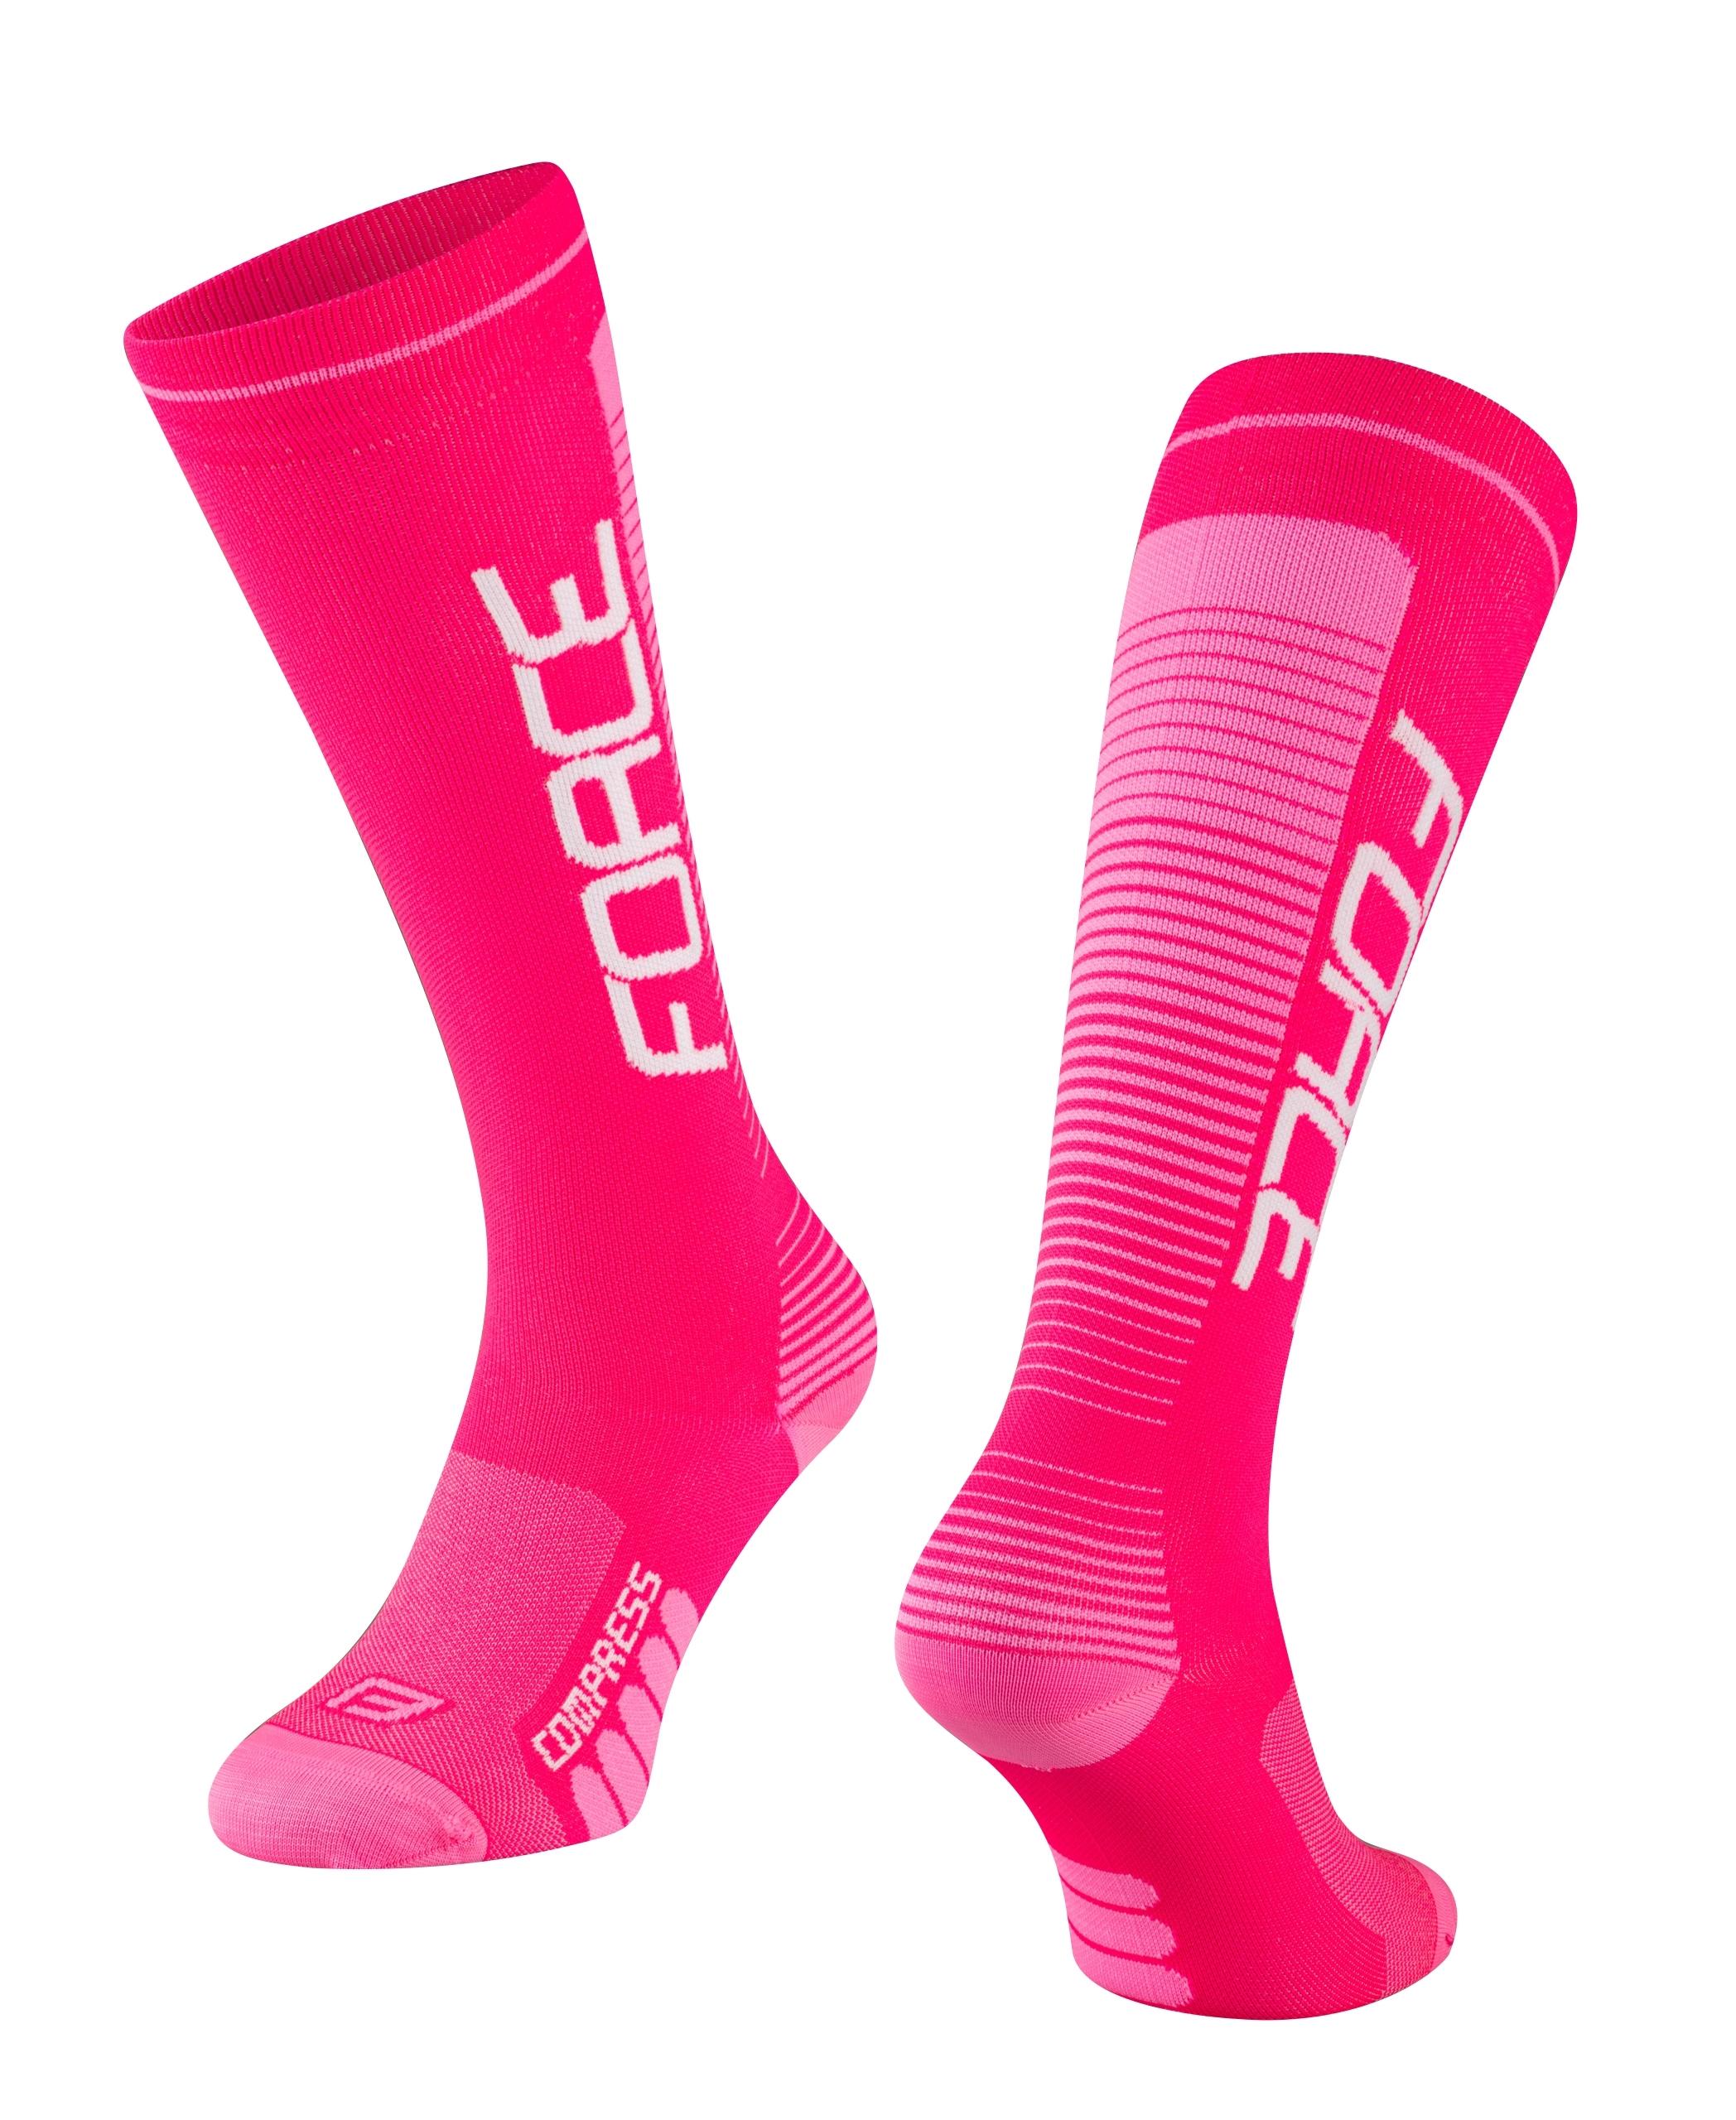 ponožky F COMPRESS, růžové S-M/36-41